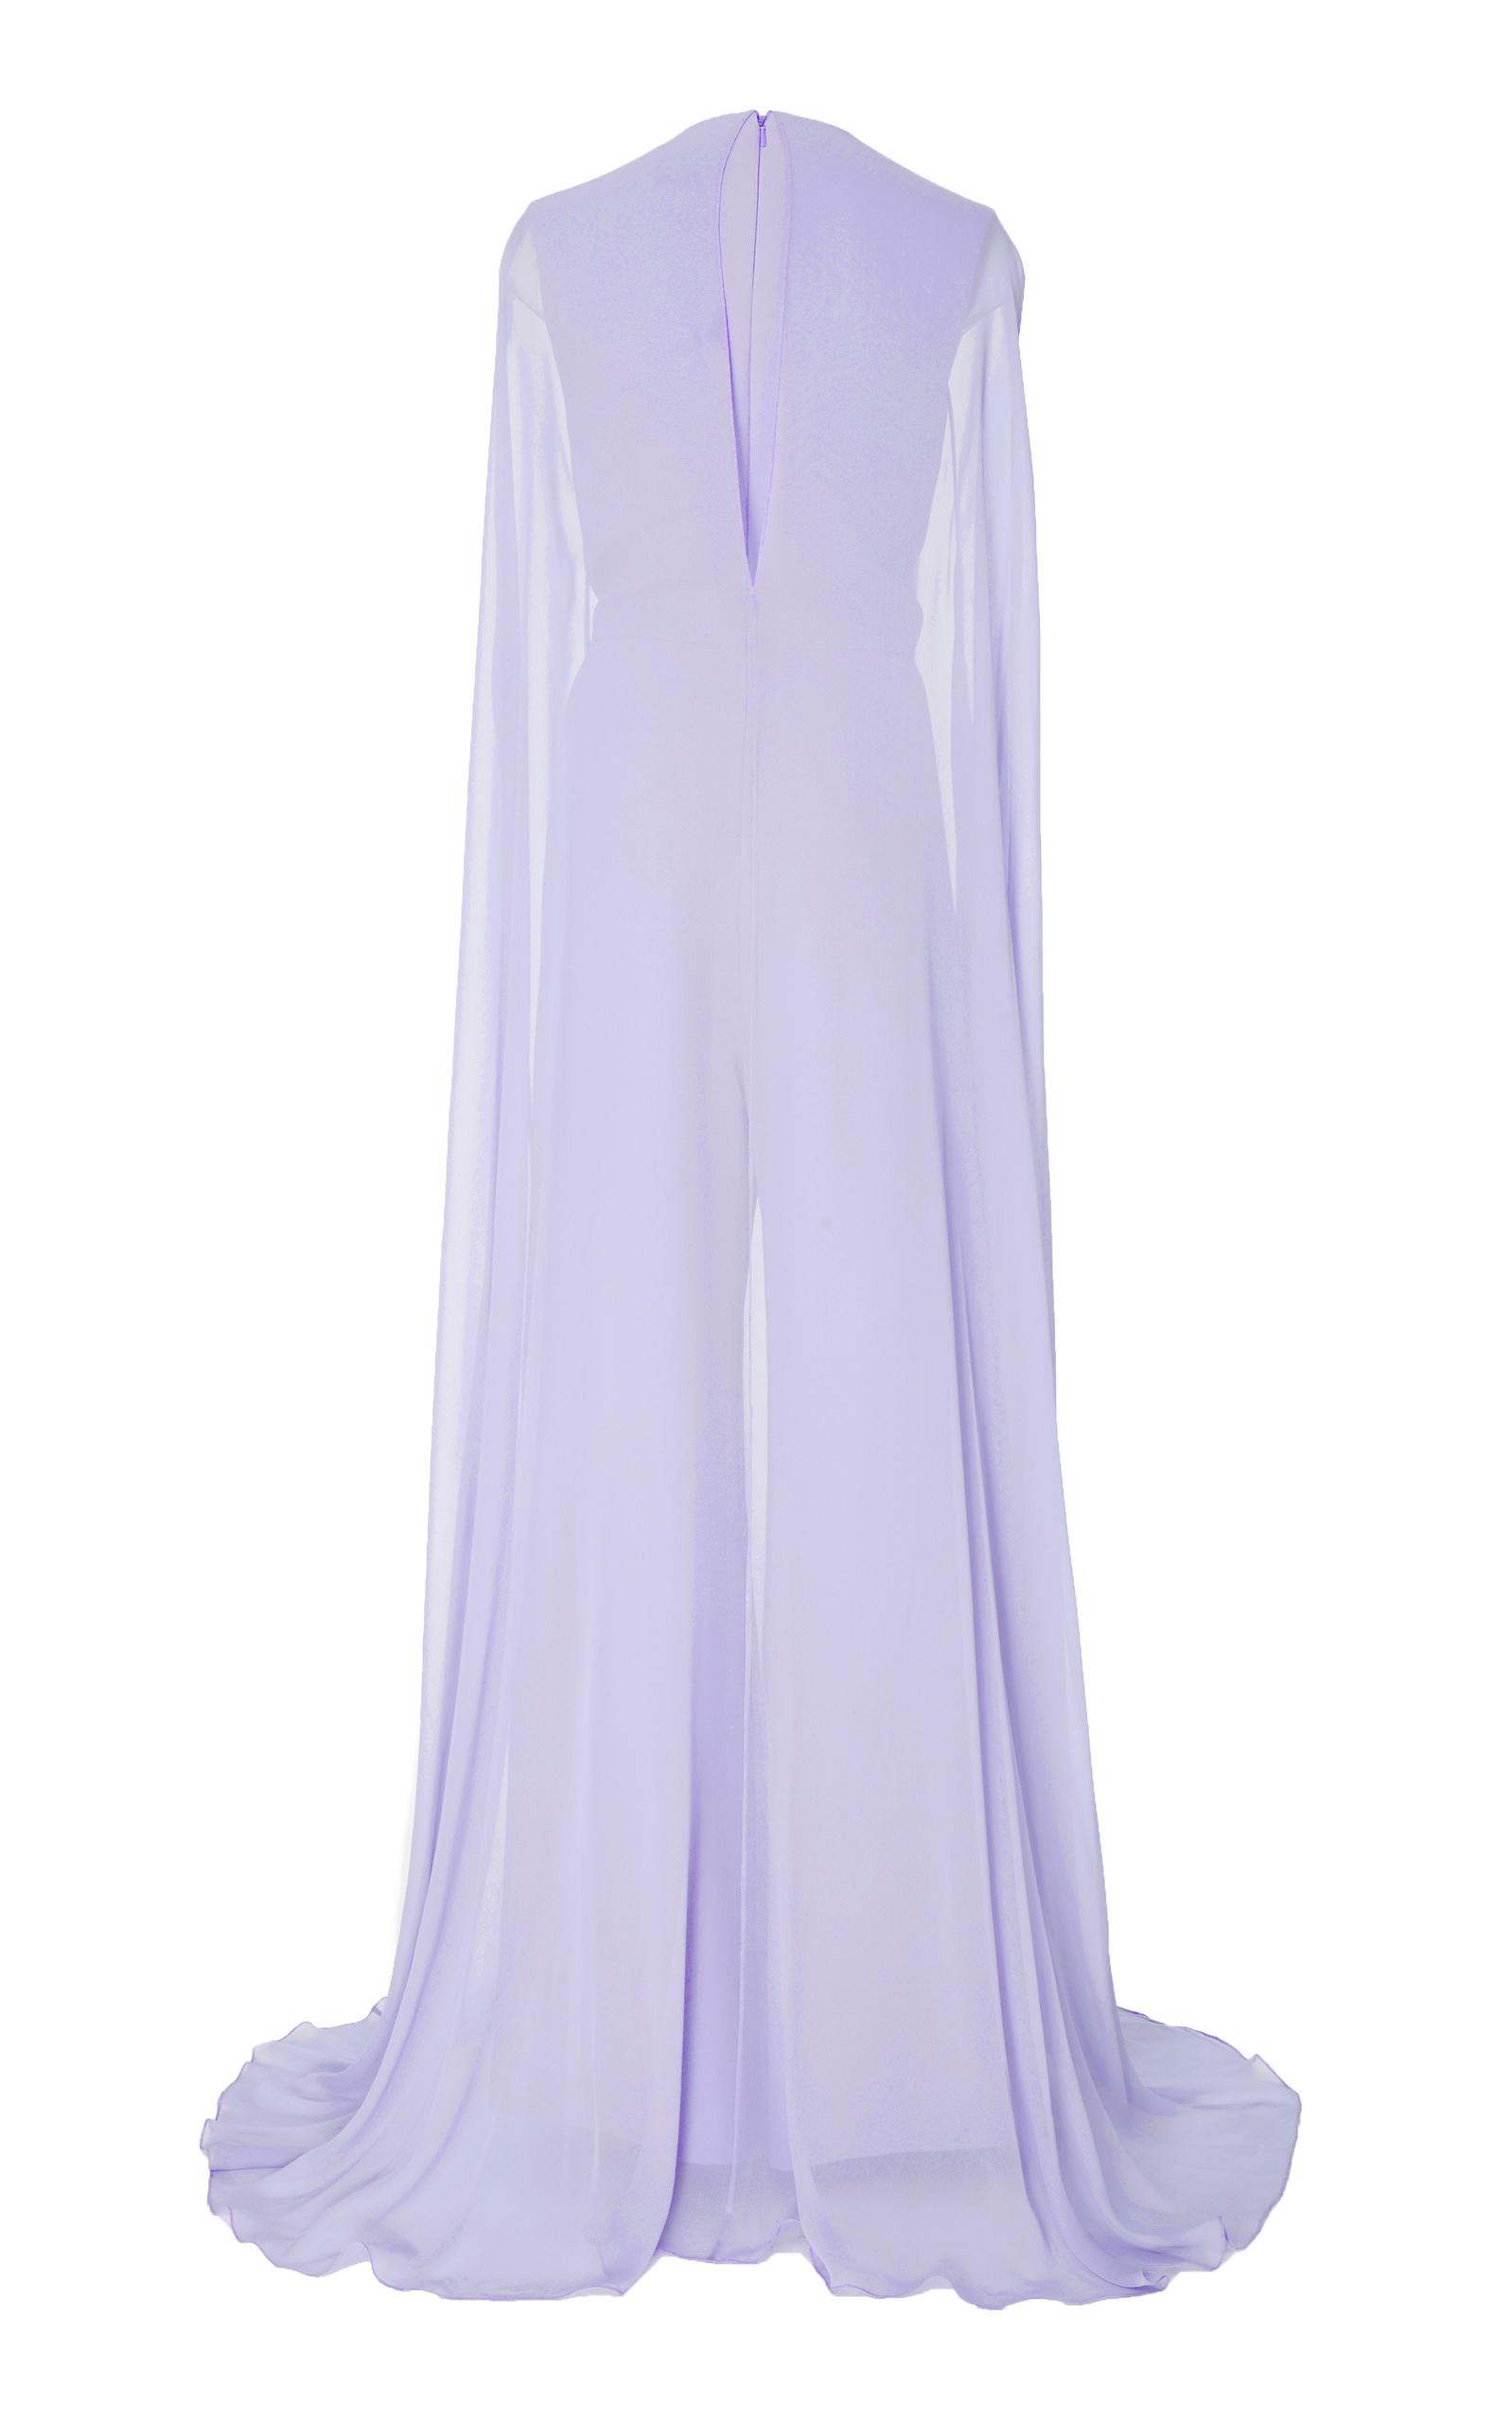 31e462d4ad0 Reem AcraChiffon Silk Jumpsuit. CLOSE. Loading. Loading